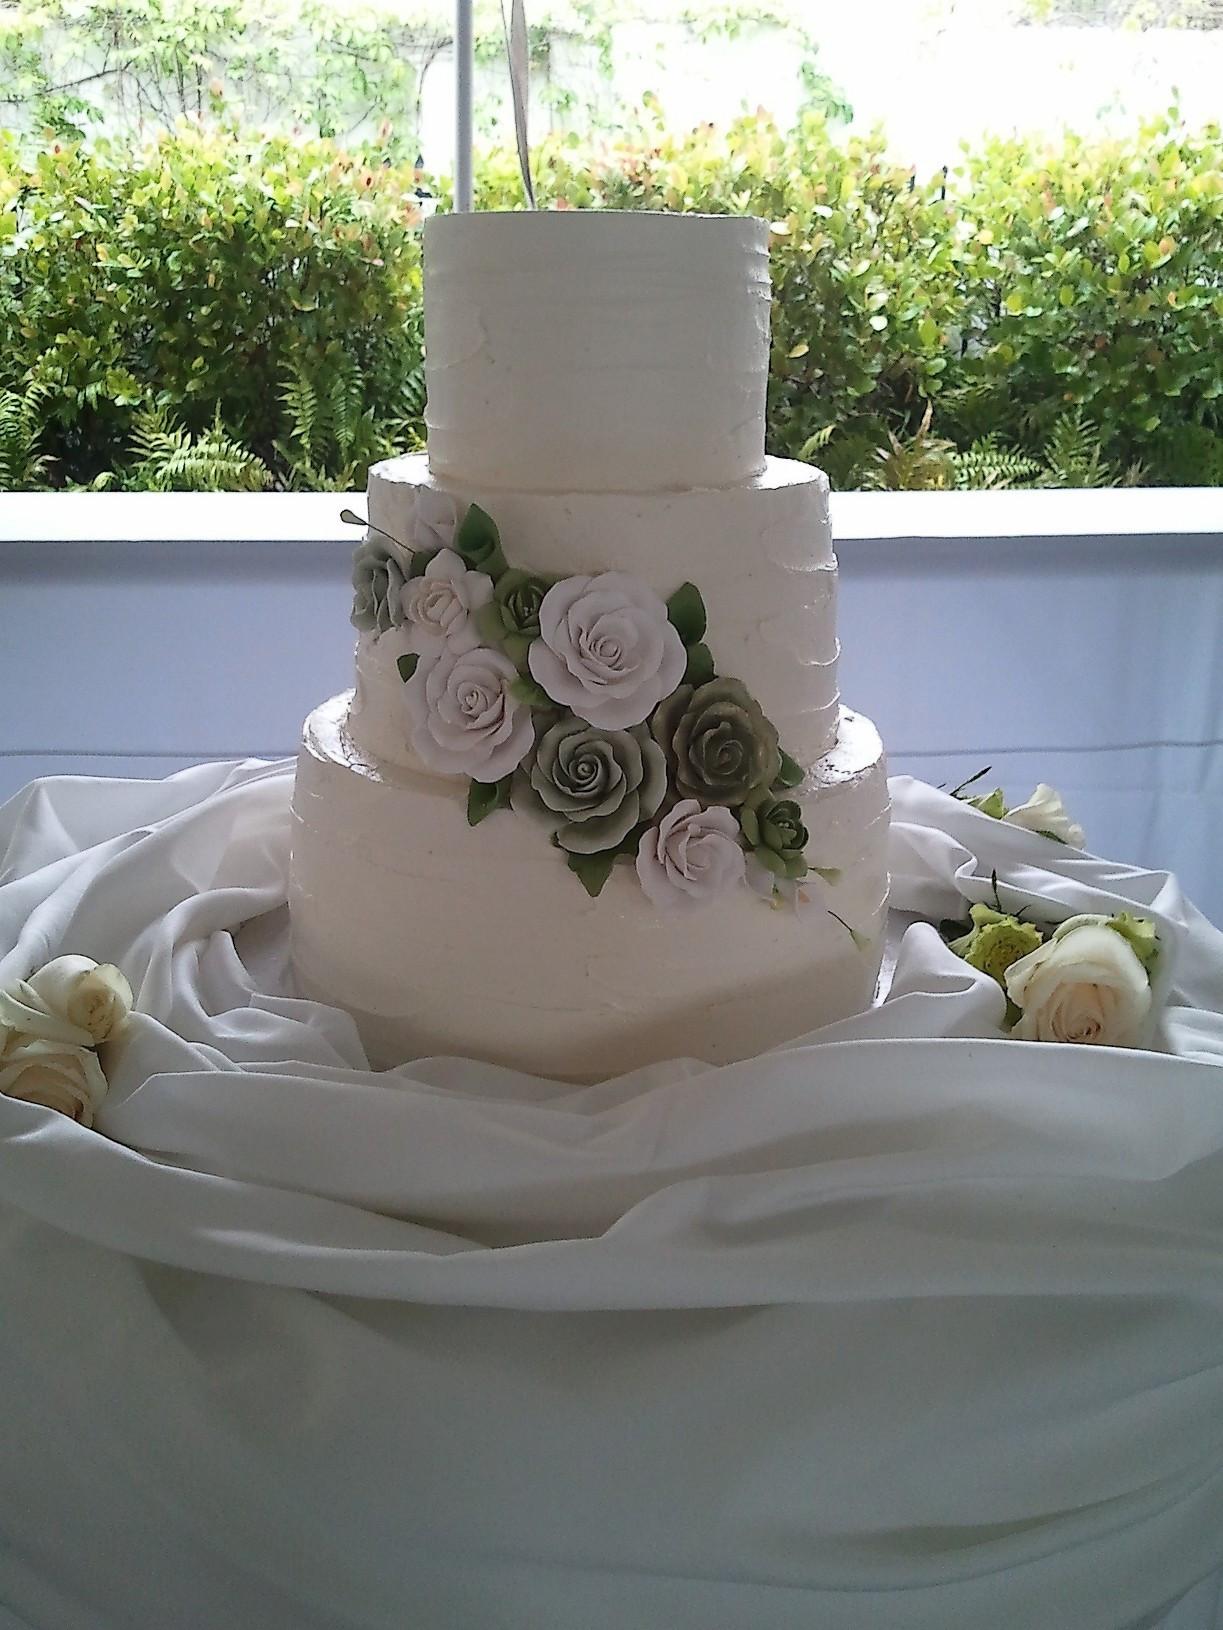 Wedding Cakes West Palm Beach  Wedding Cakes Ganache Bakery Cafe West Palm Beach